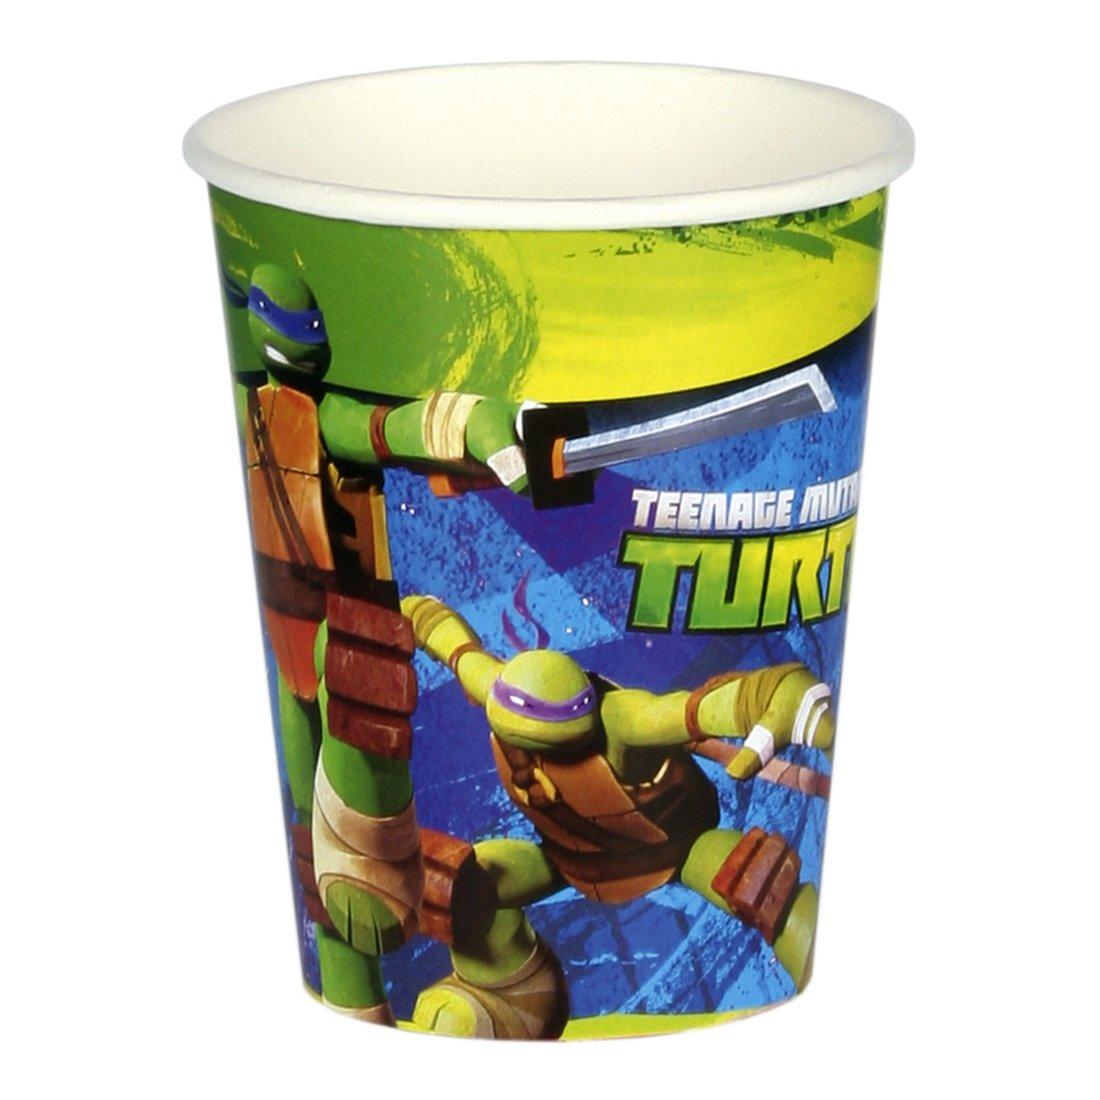 copa cumpleaños Teenage Mutant Ninja Turtles 8 vaso de ...